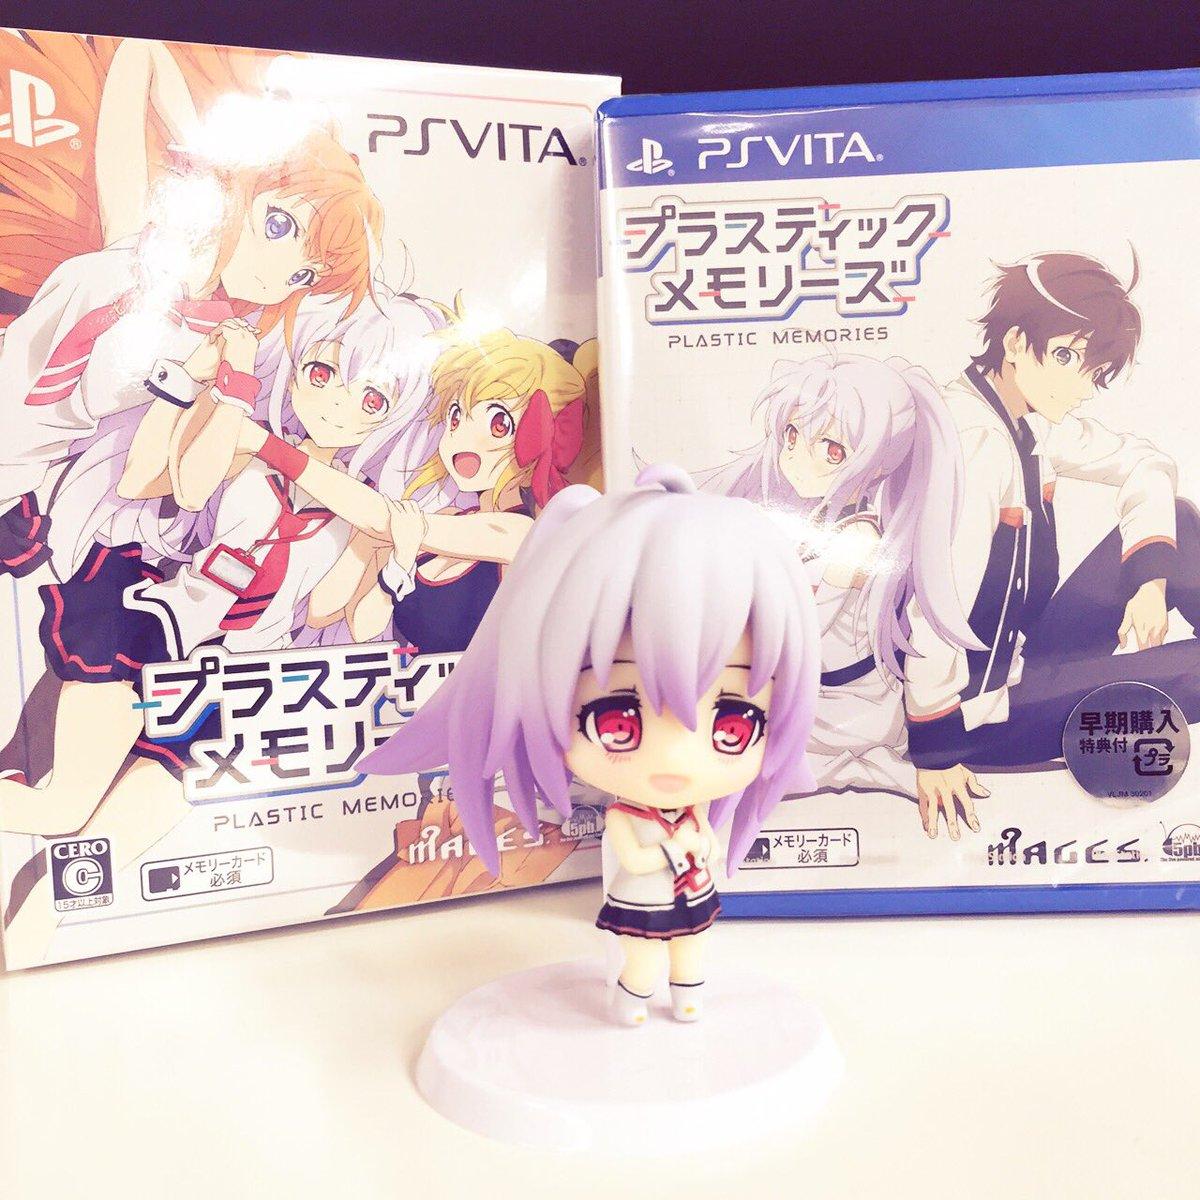 @5pbgames: PS Vita「プラスティック・メモリーズ」本日発売です!大切な人と いつかまた めぐり会えますよ